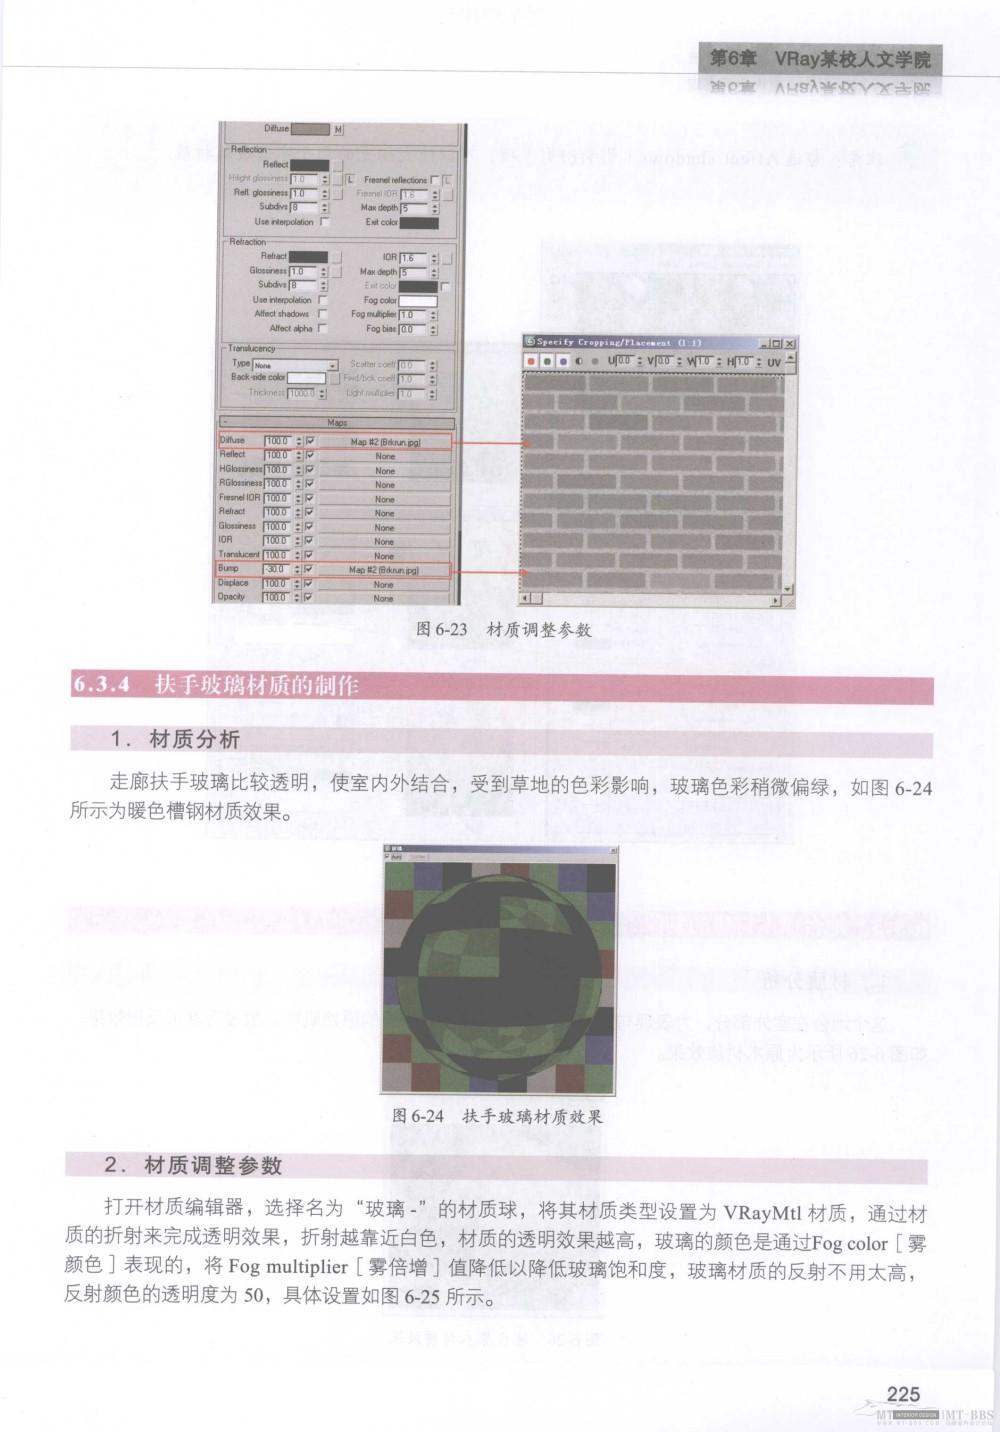 水晶石技法-3ds_Max&VRay室内空间表现_水晶石技法-3ds_Max&VRay室内空间表现_页面_231.jpg